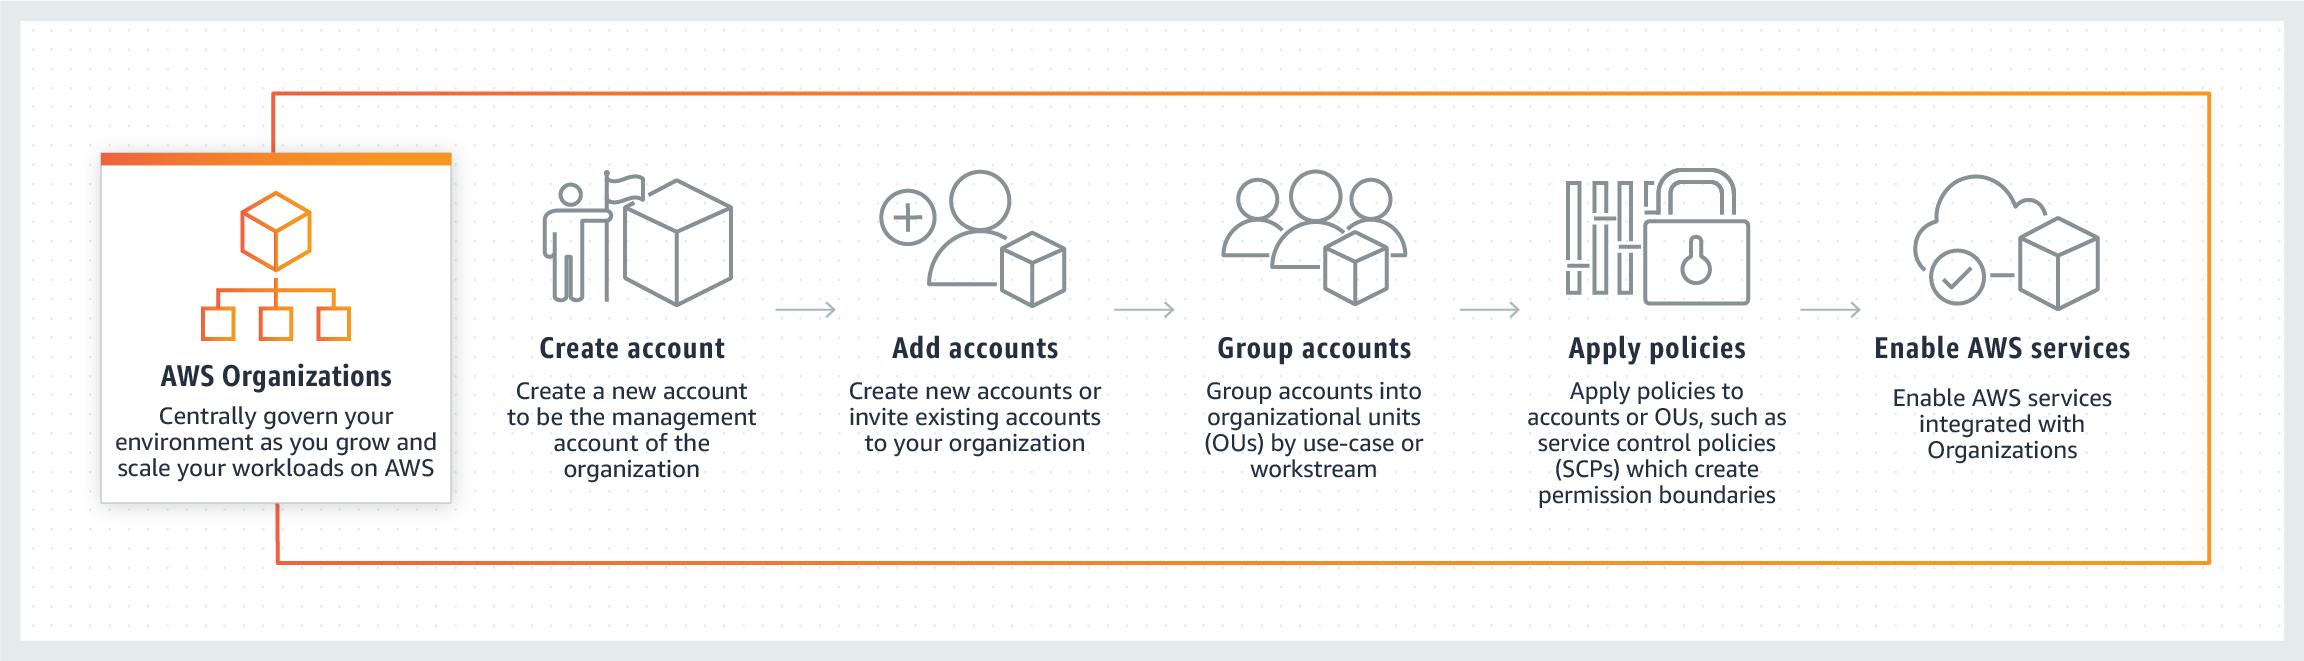 Diagram_AWS-Organizations_How-It_Works_v2